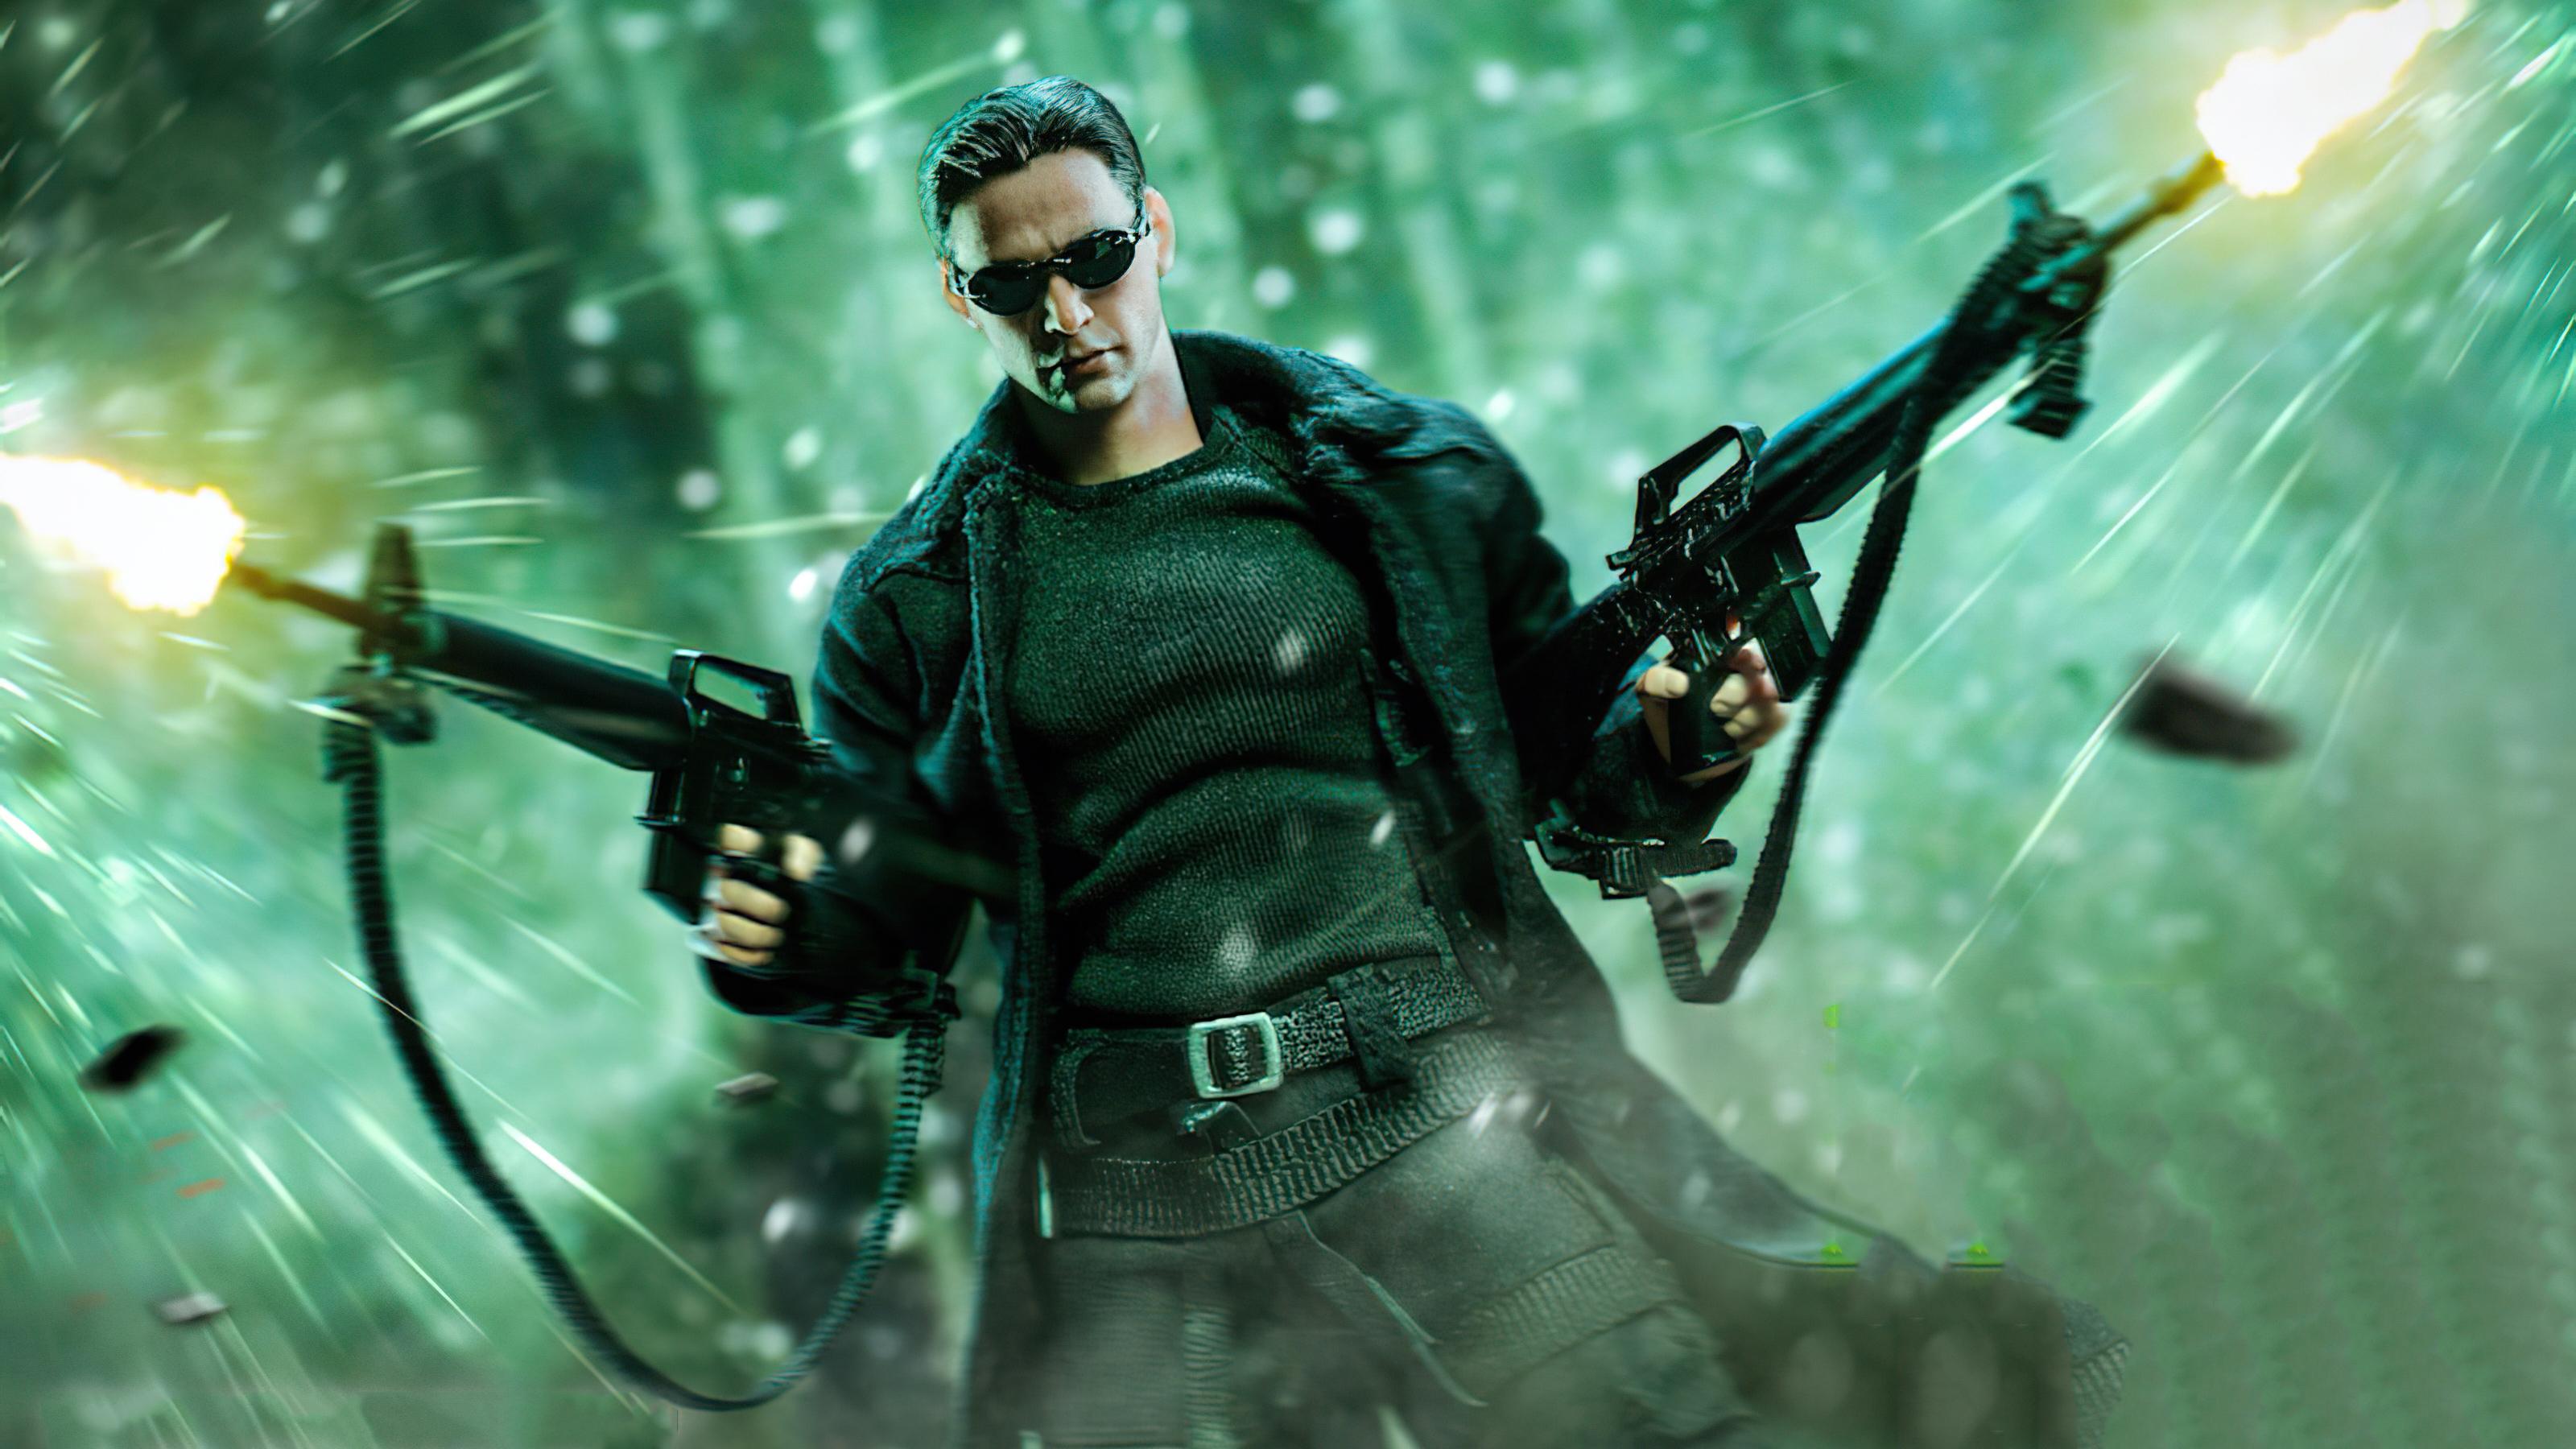 Neo Matrix 4k, HD Movies, 4k Wallpapers, Images ...